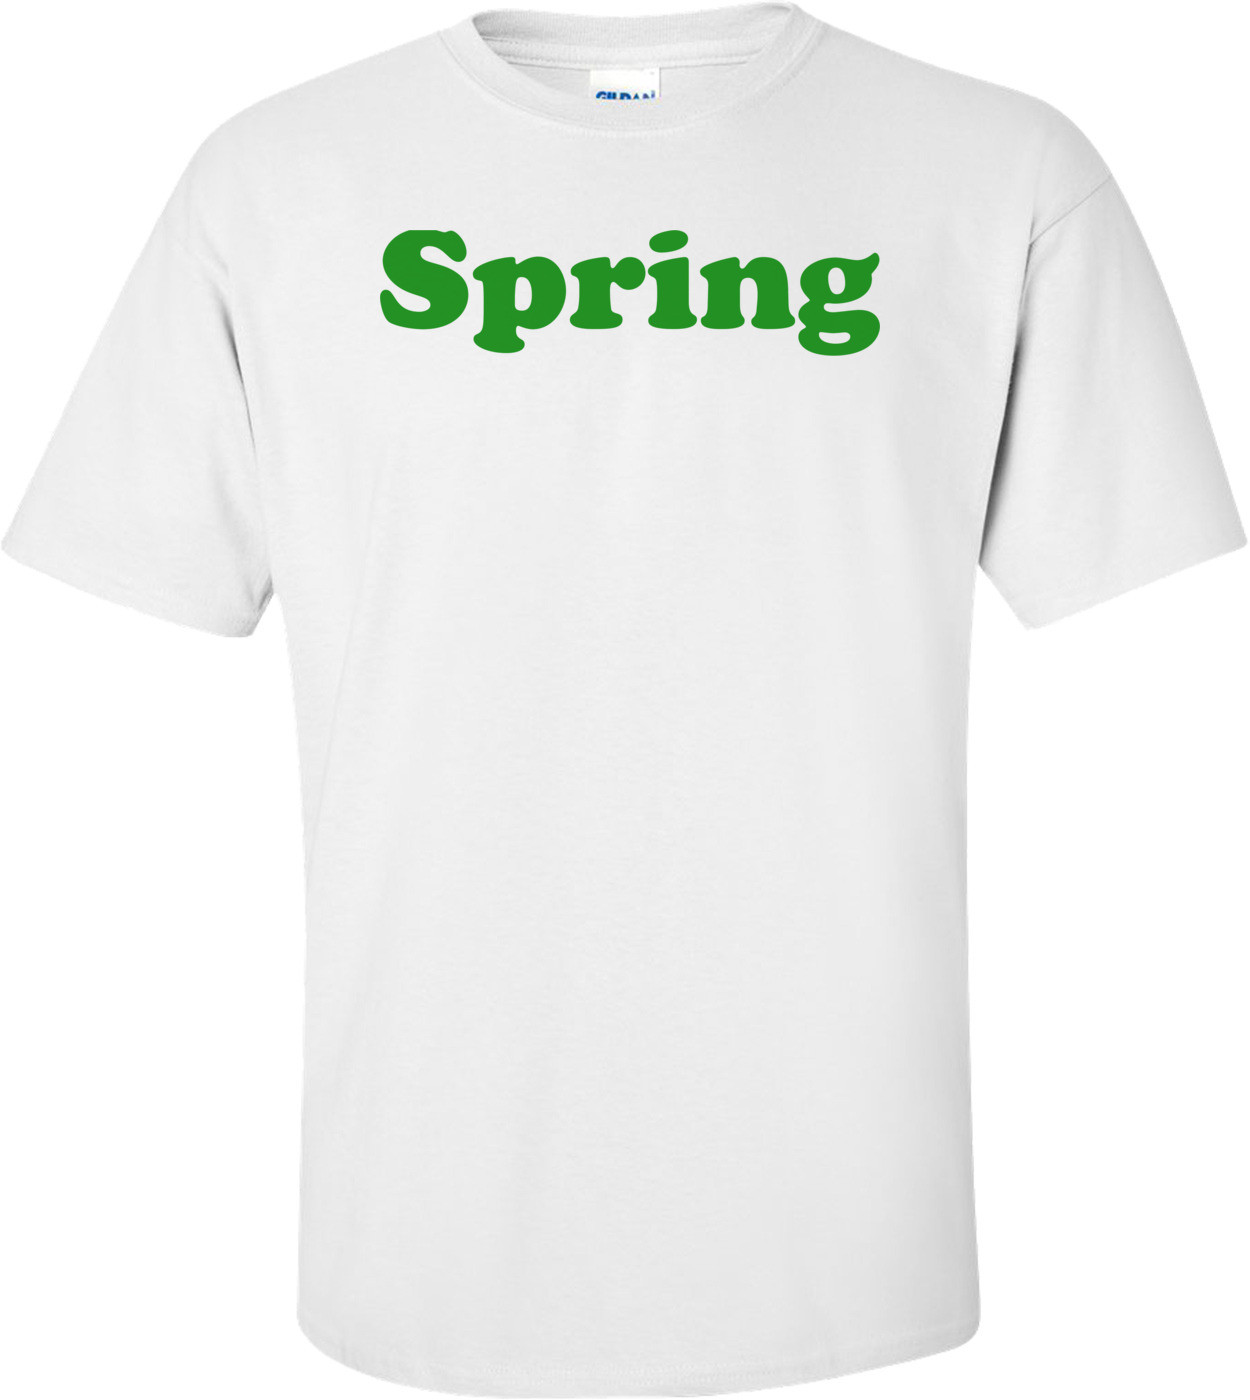 Spring - Maternity Shirt